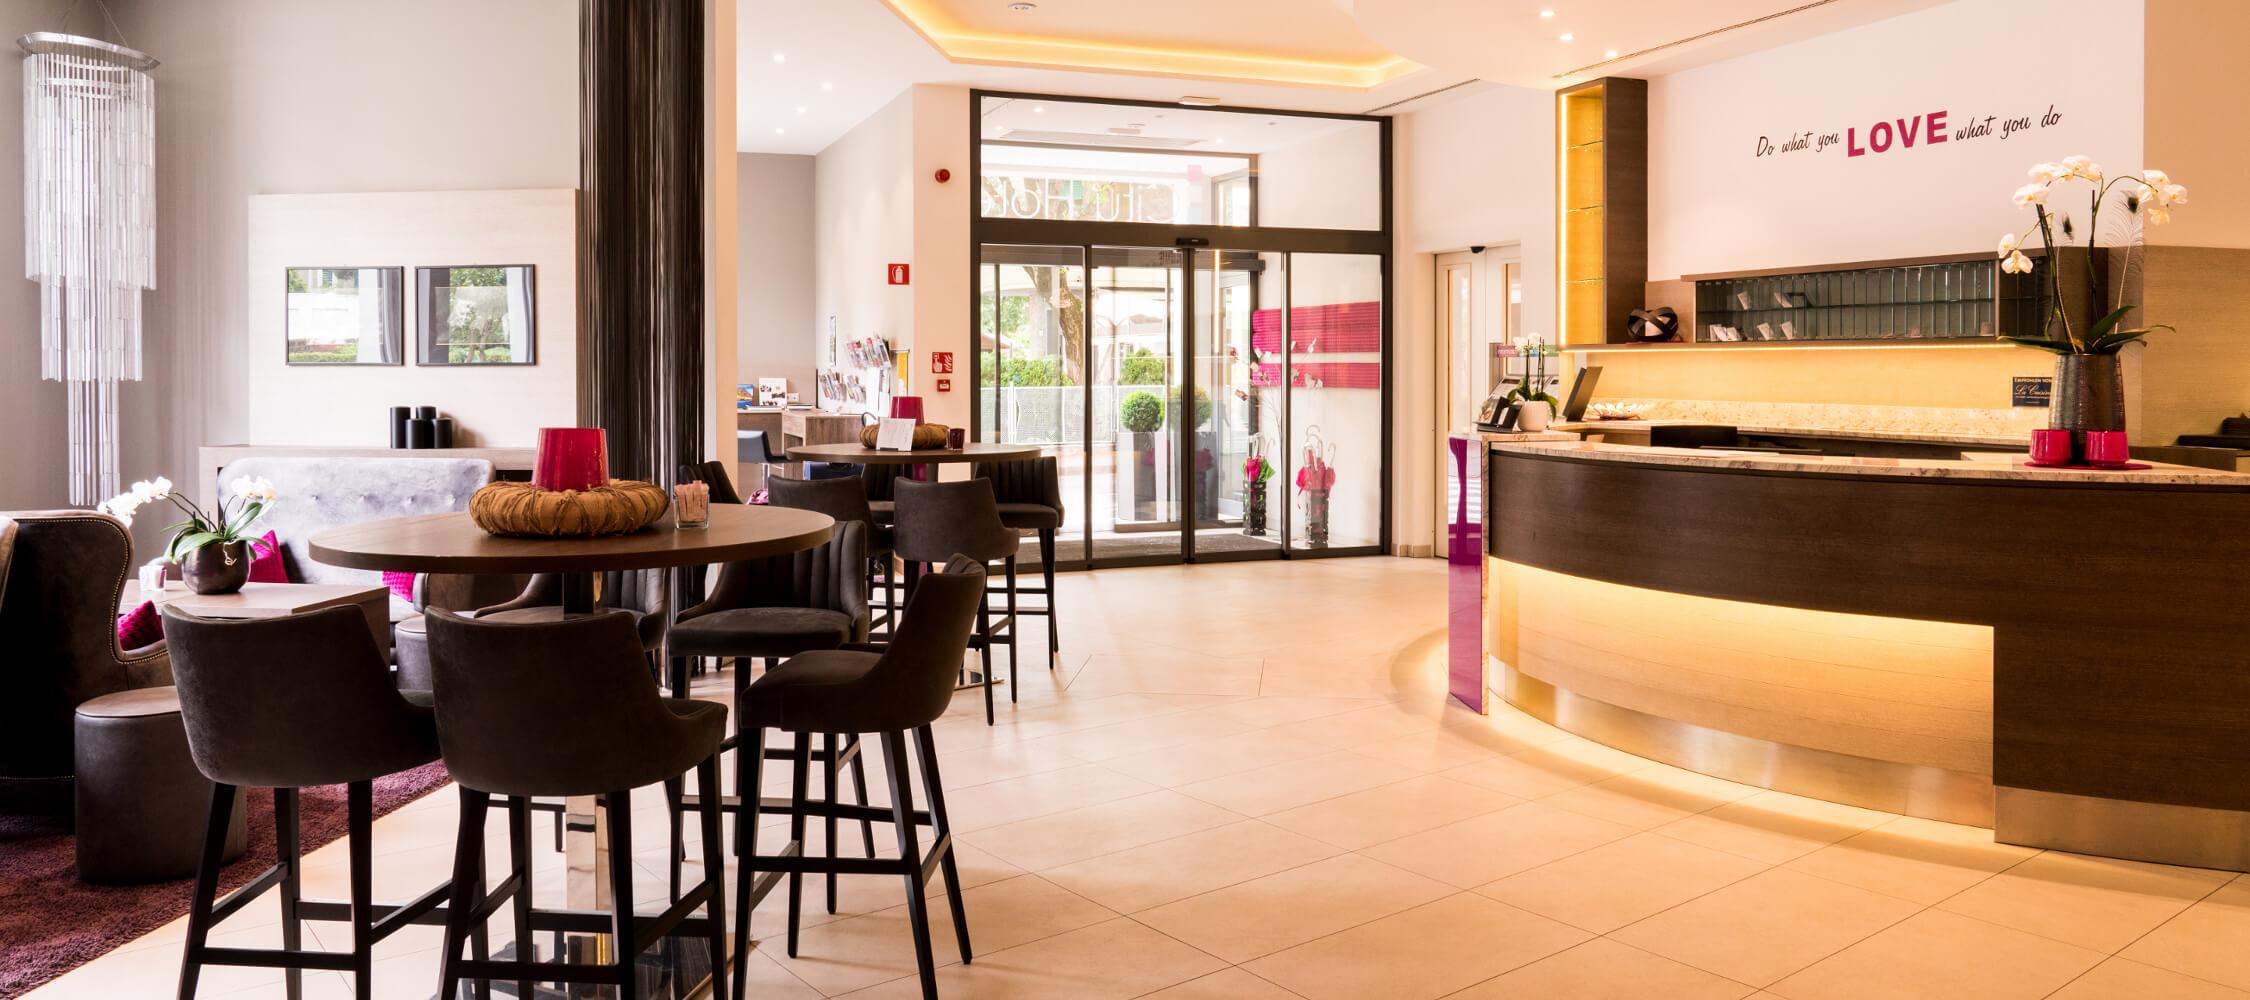 City_Hotel_Merano_Reception_Lobby_BeatricePilottto_DSC03663_2250x1000